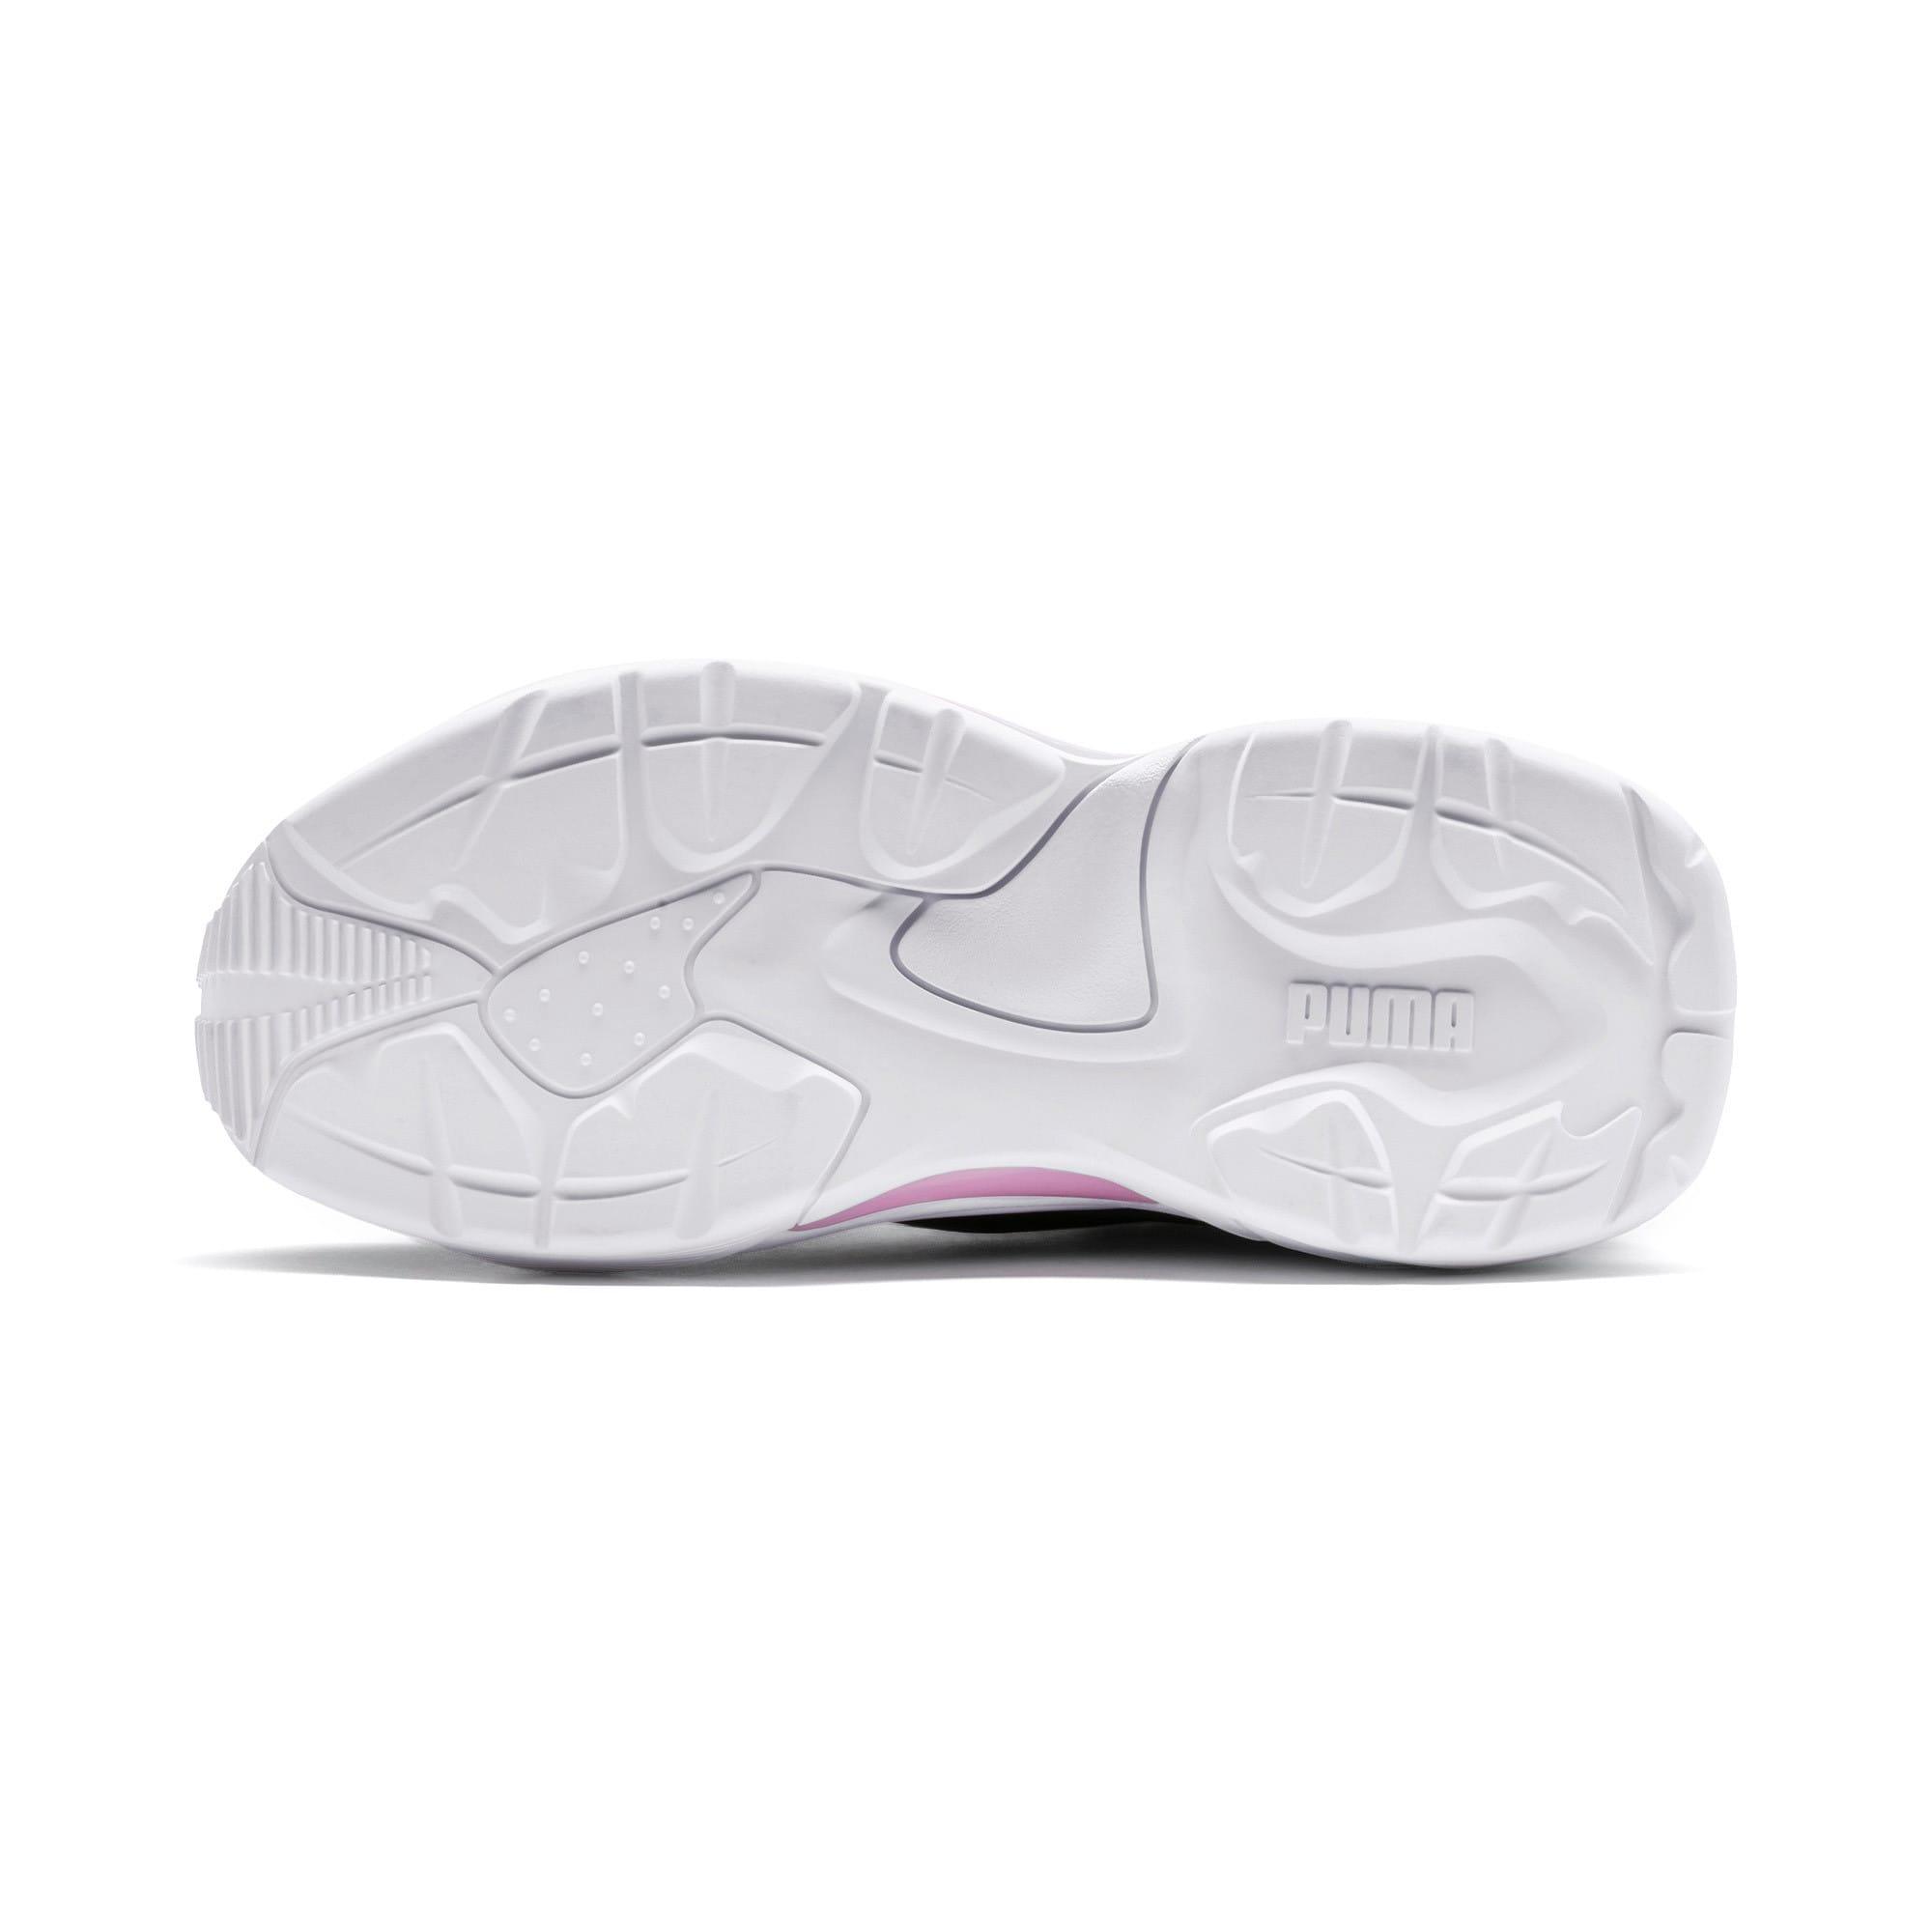 Miniatura 5 de Zapatos deportivos para mujer Thunder Trailblazer, Puma Black-Pale Pink, mediano